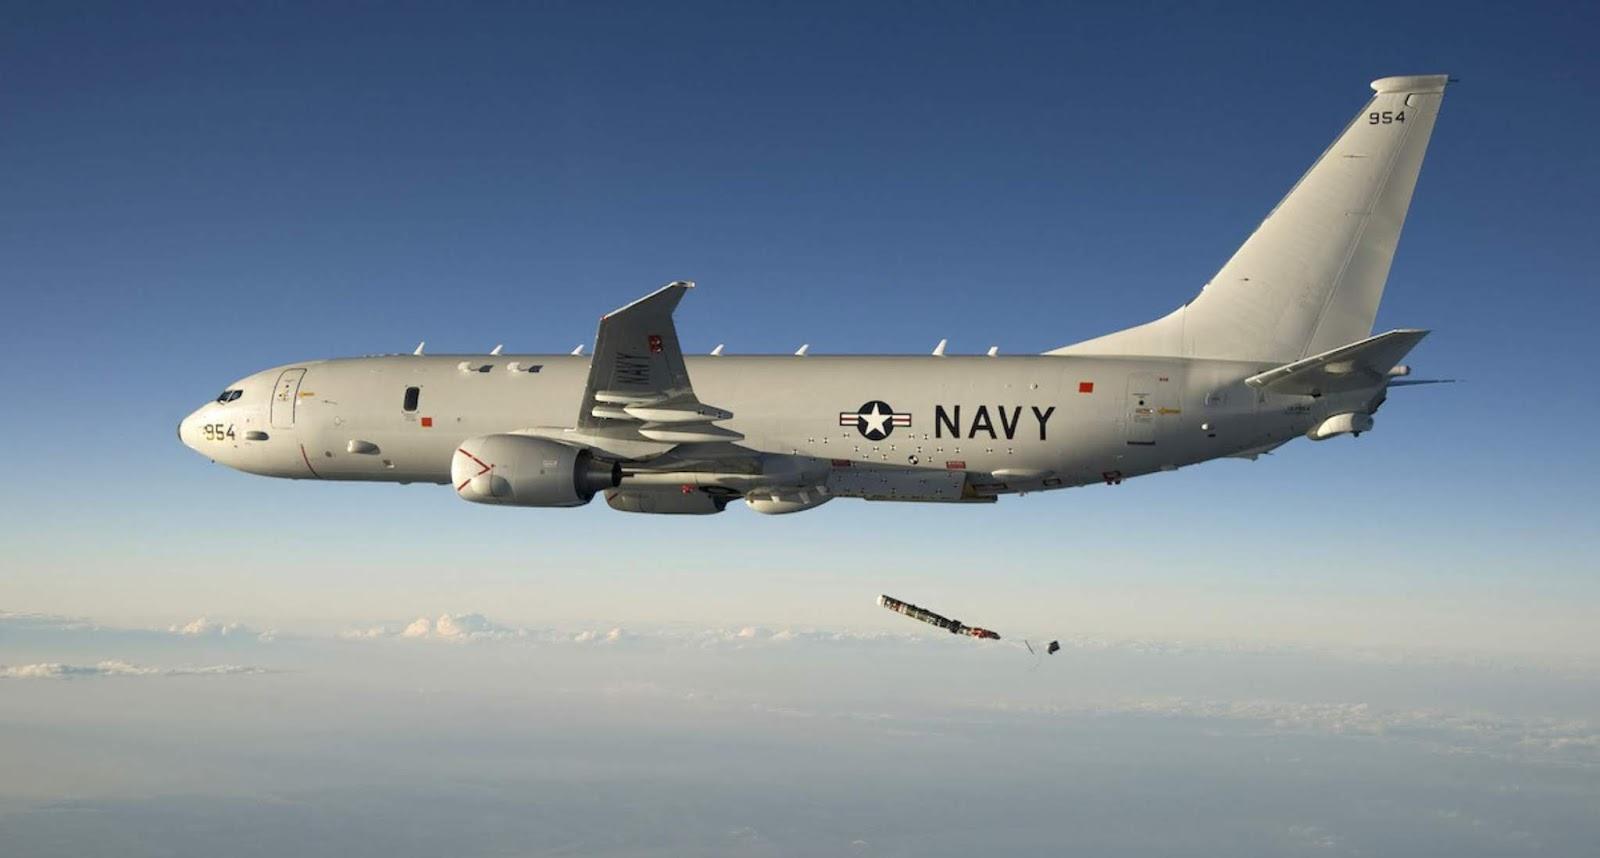 Pesawat intai Amerika ngintip latihan frigat Rusia di Mediterania